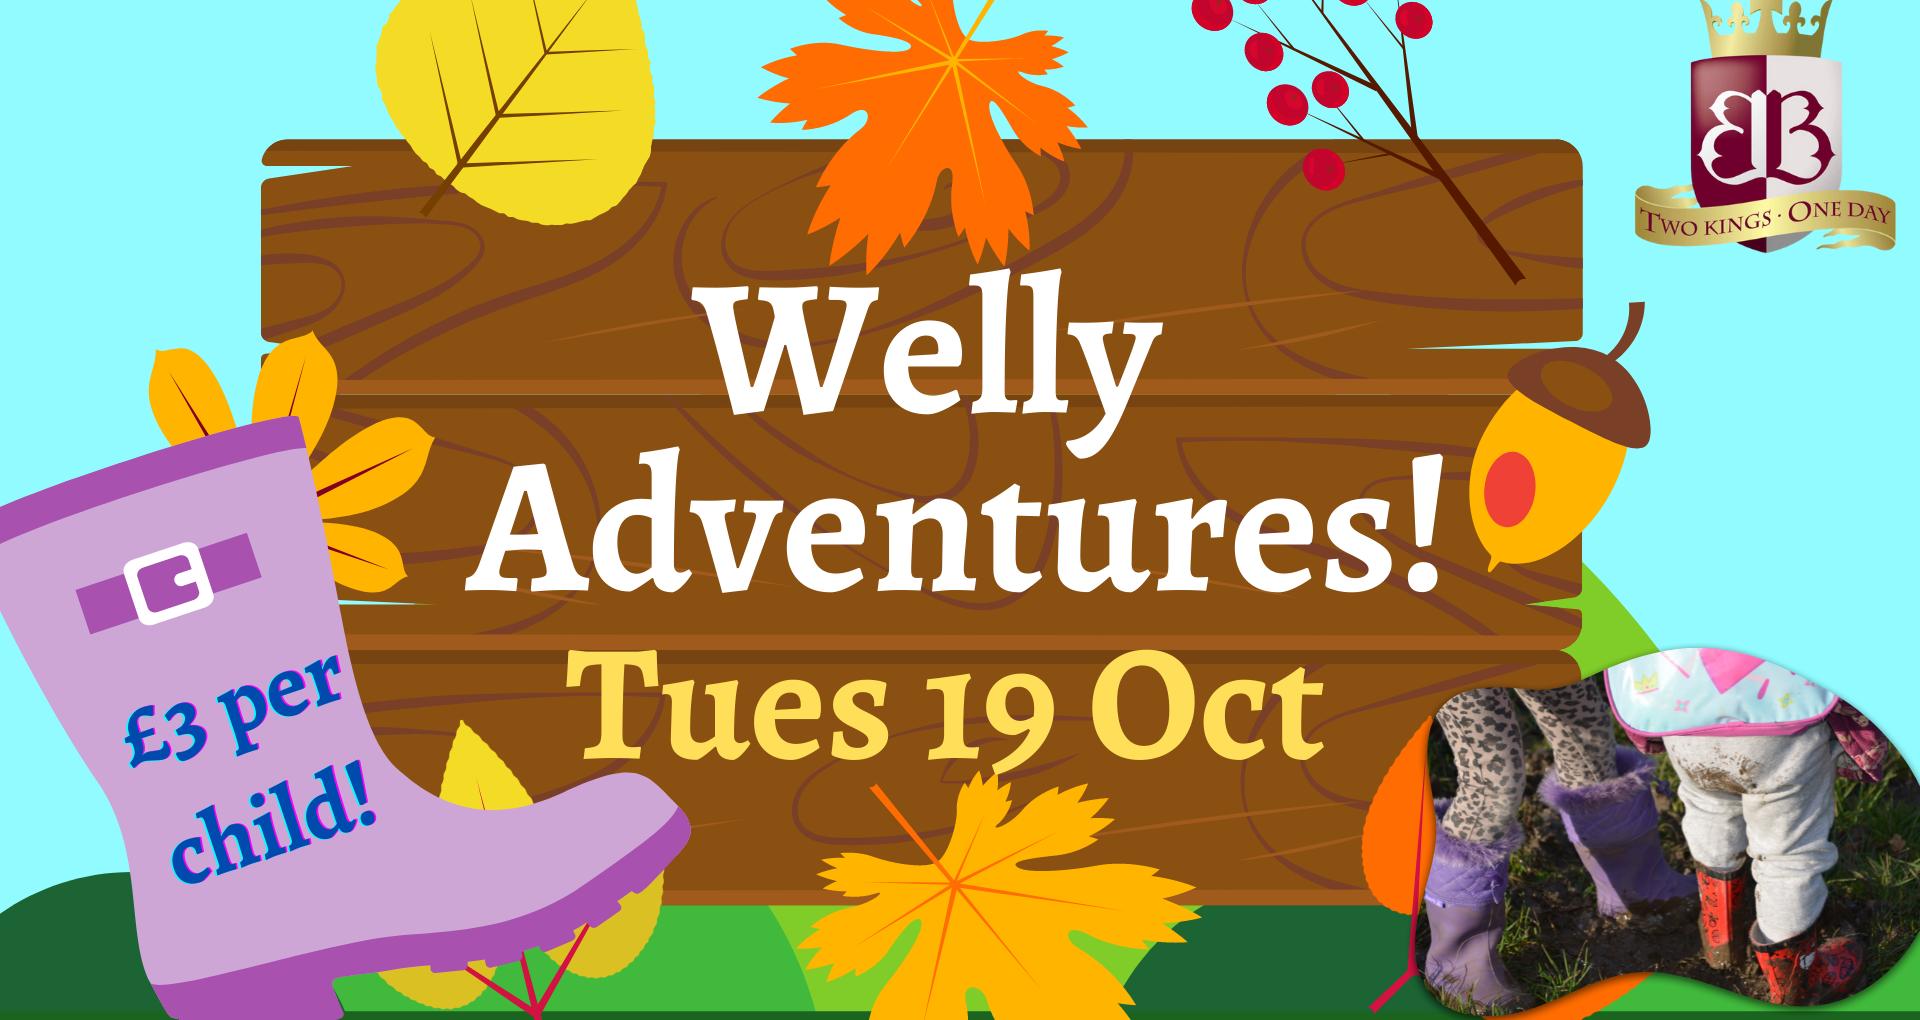 Welly Adventures